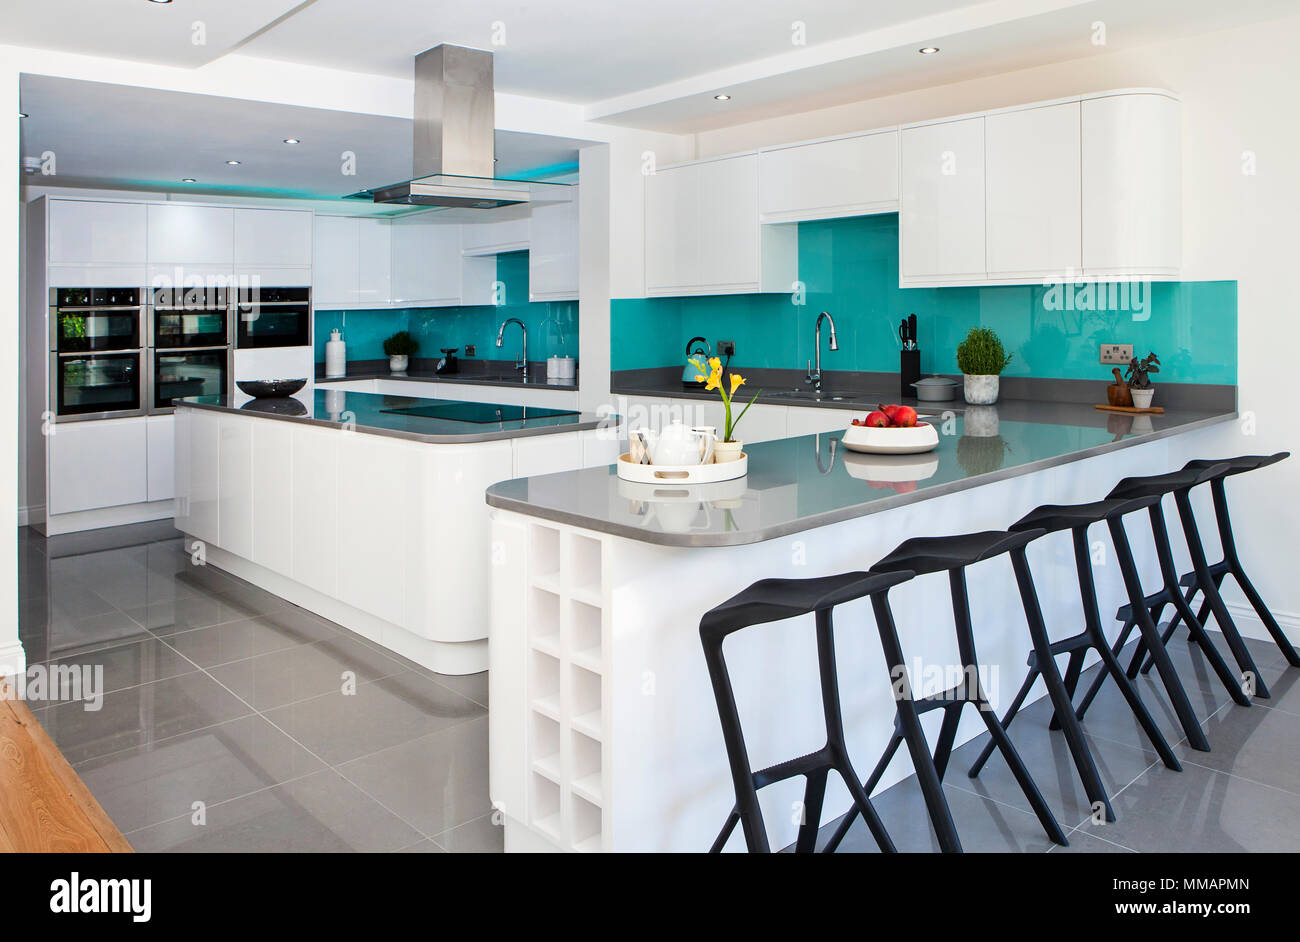 Home interior of white modern kitchen - Stock Image